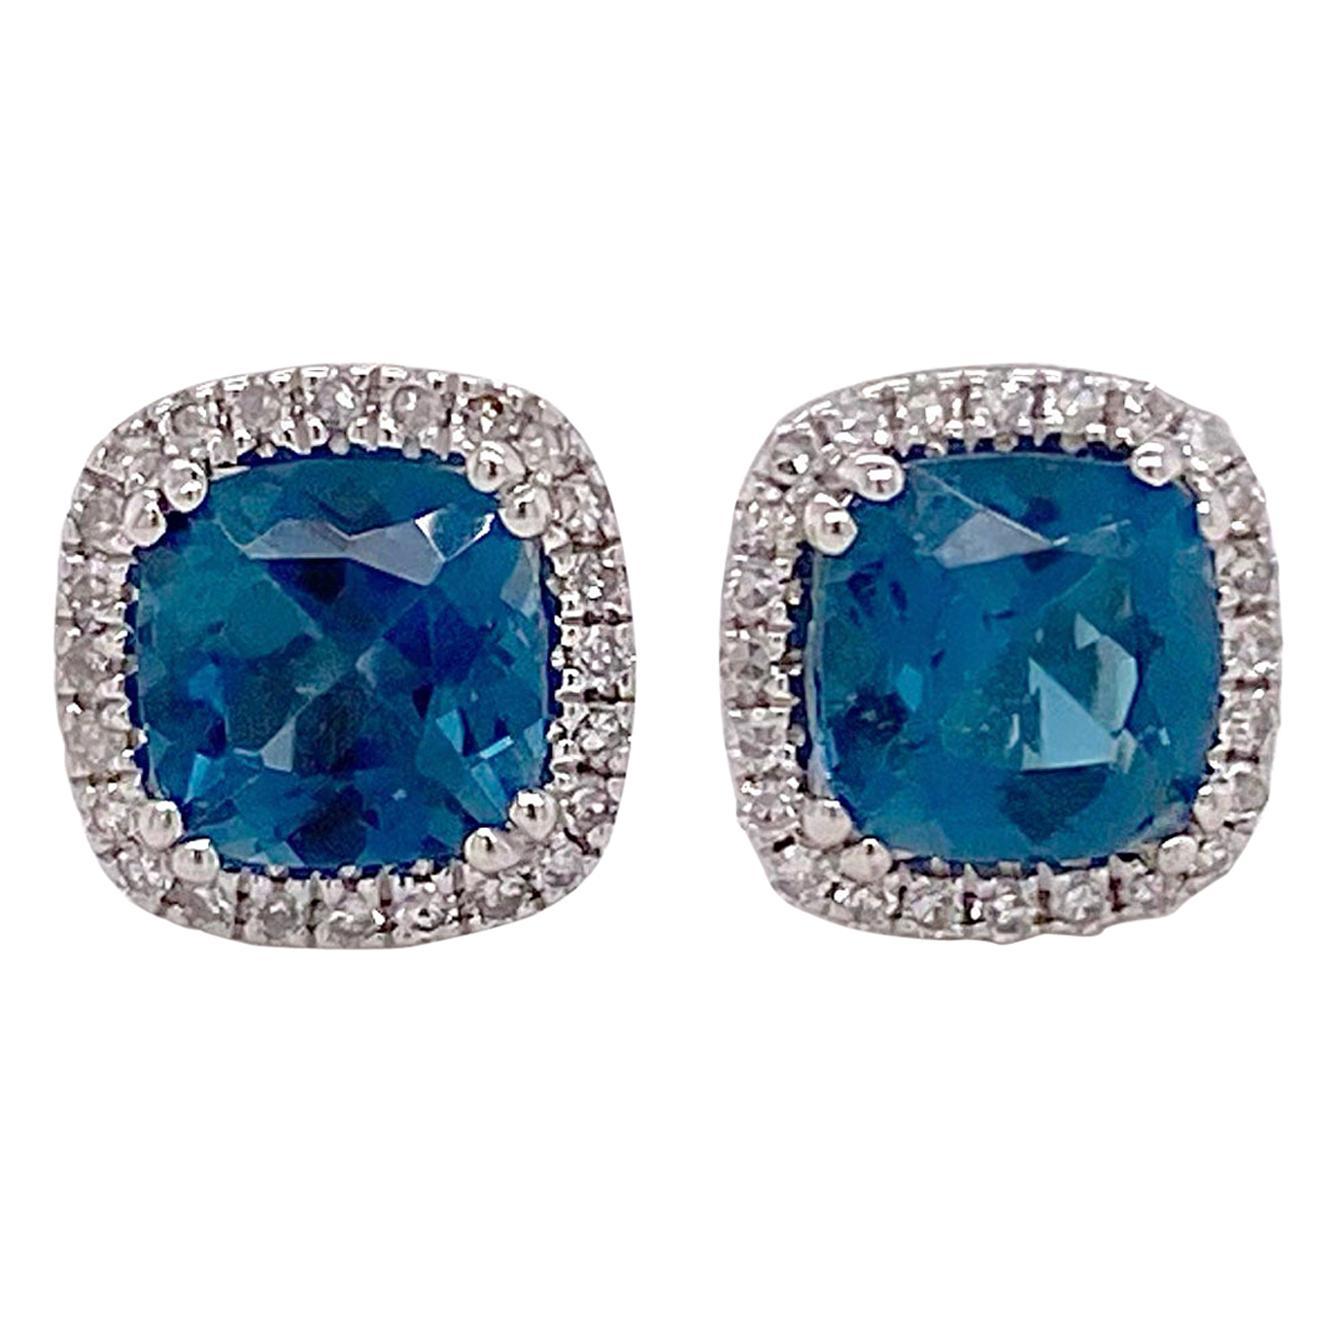 Blue Topaz Diamond Studs Earrings, Halo of Diamonds, White Gold, Cushion Topaz